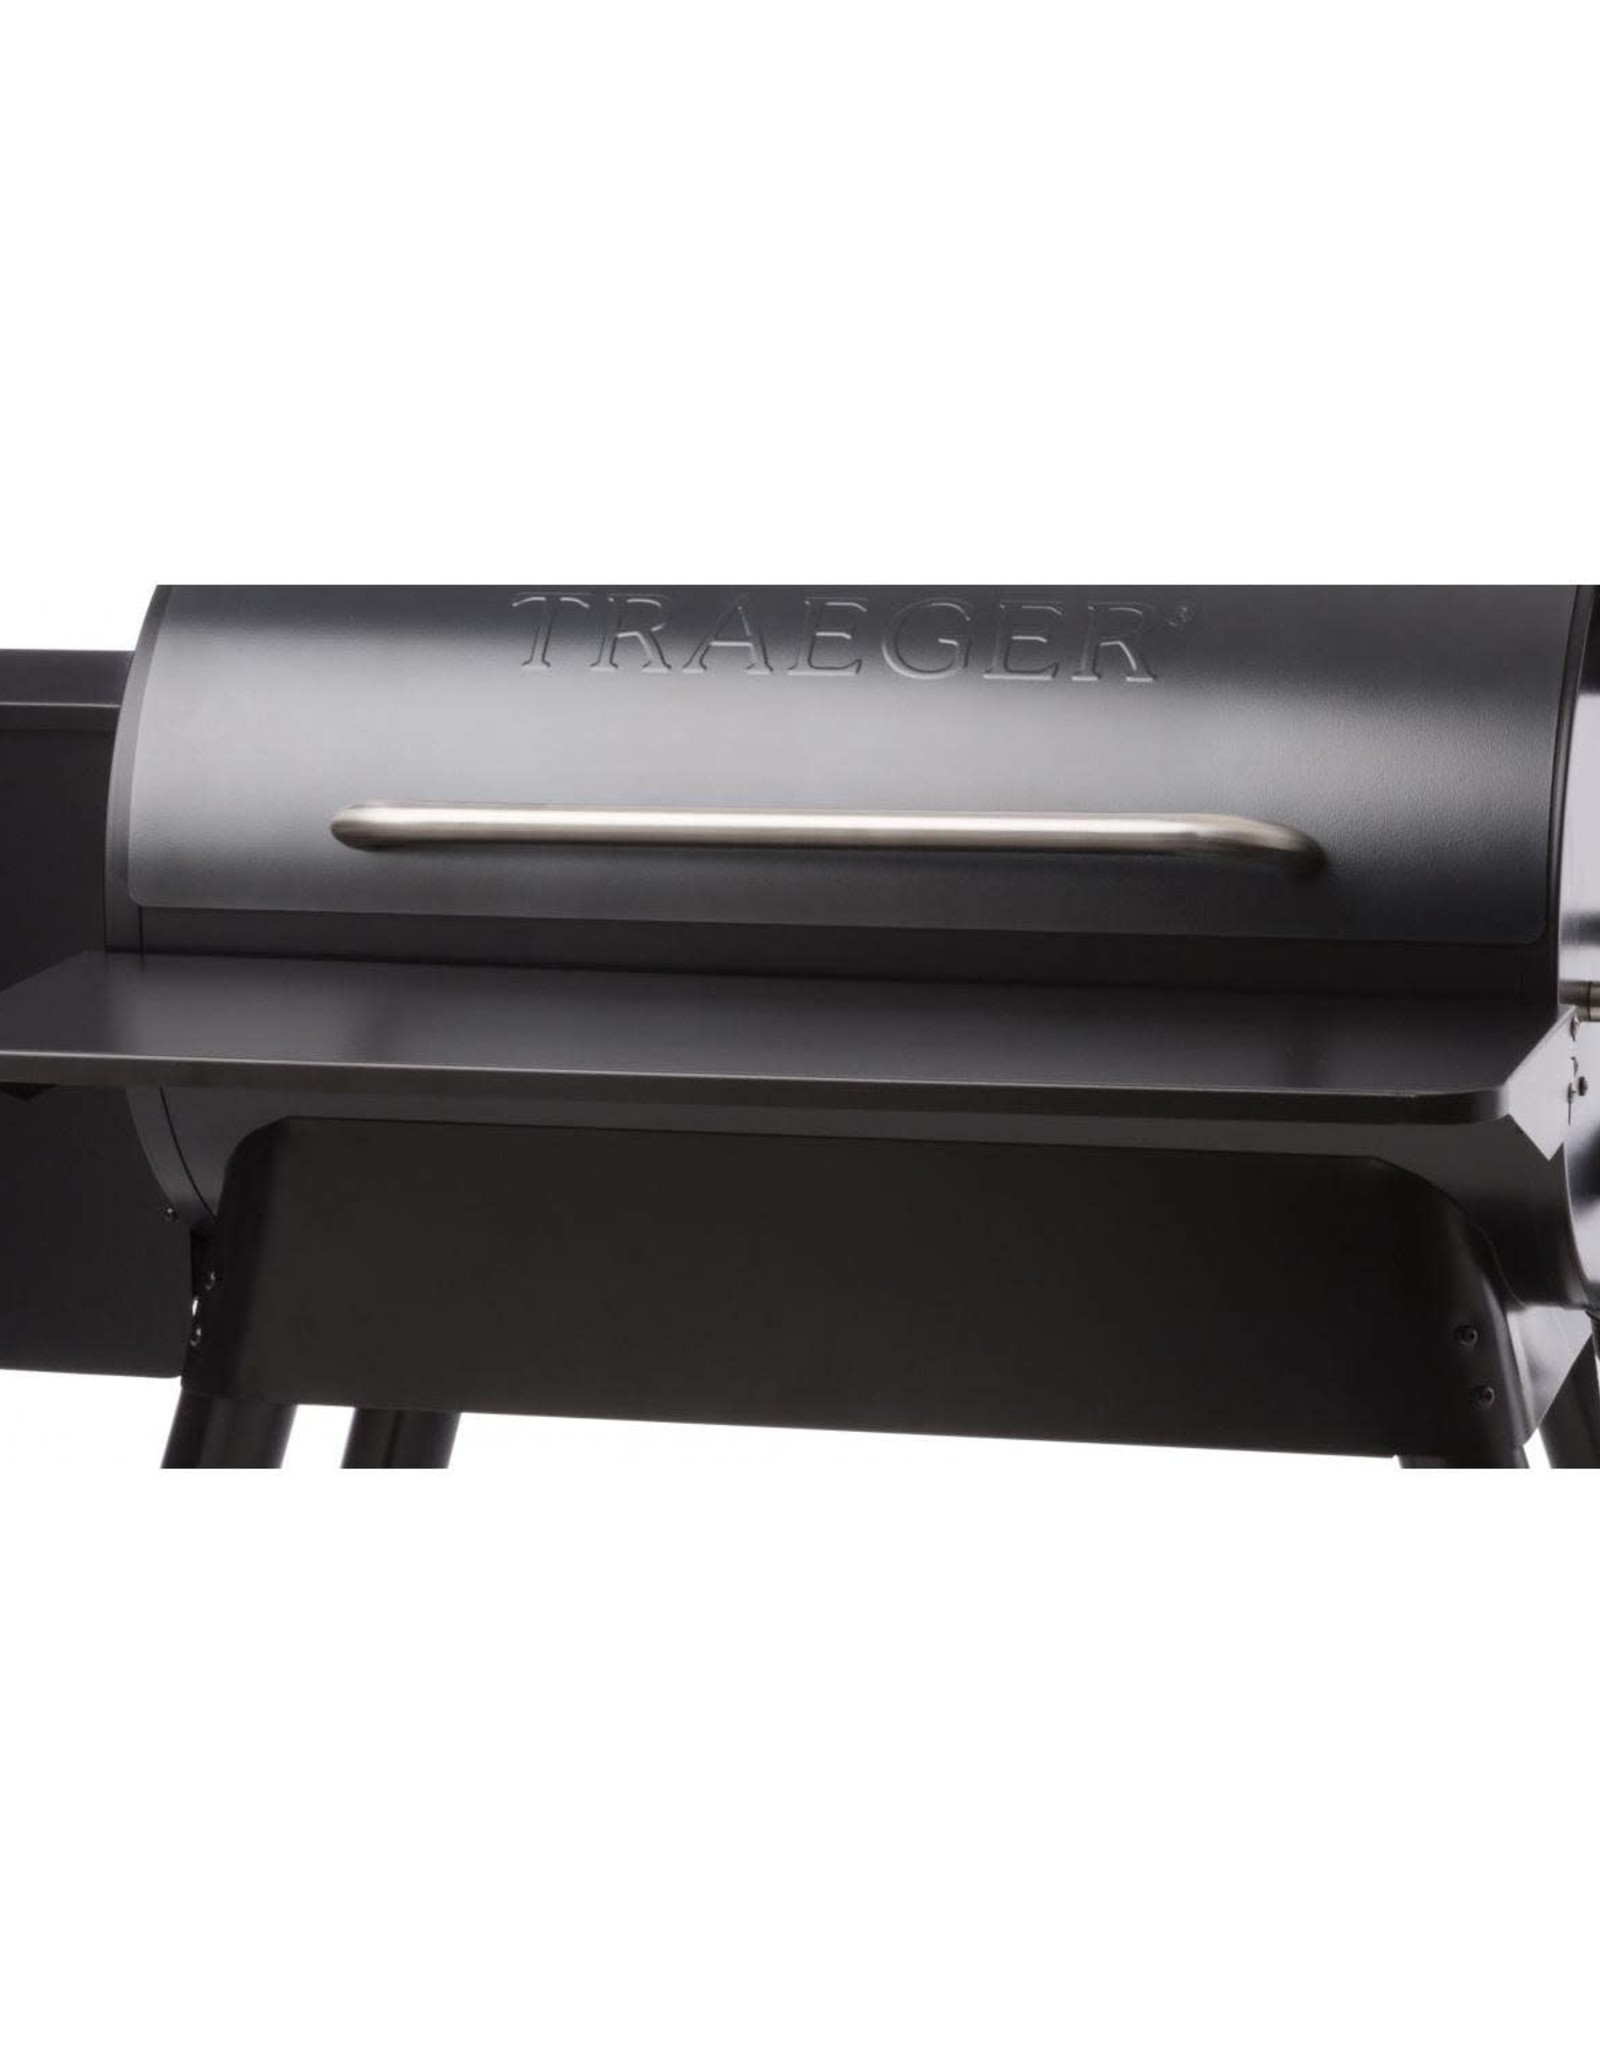 Traeger Traeger Pro Series 34 Folding Shelf - BAC363